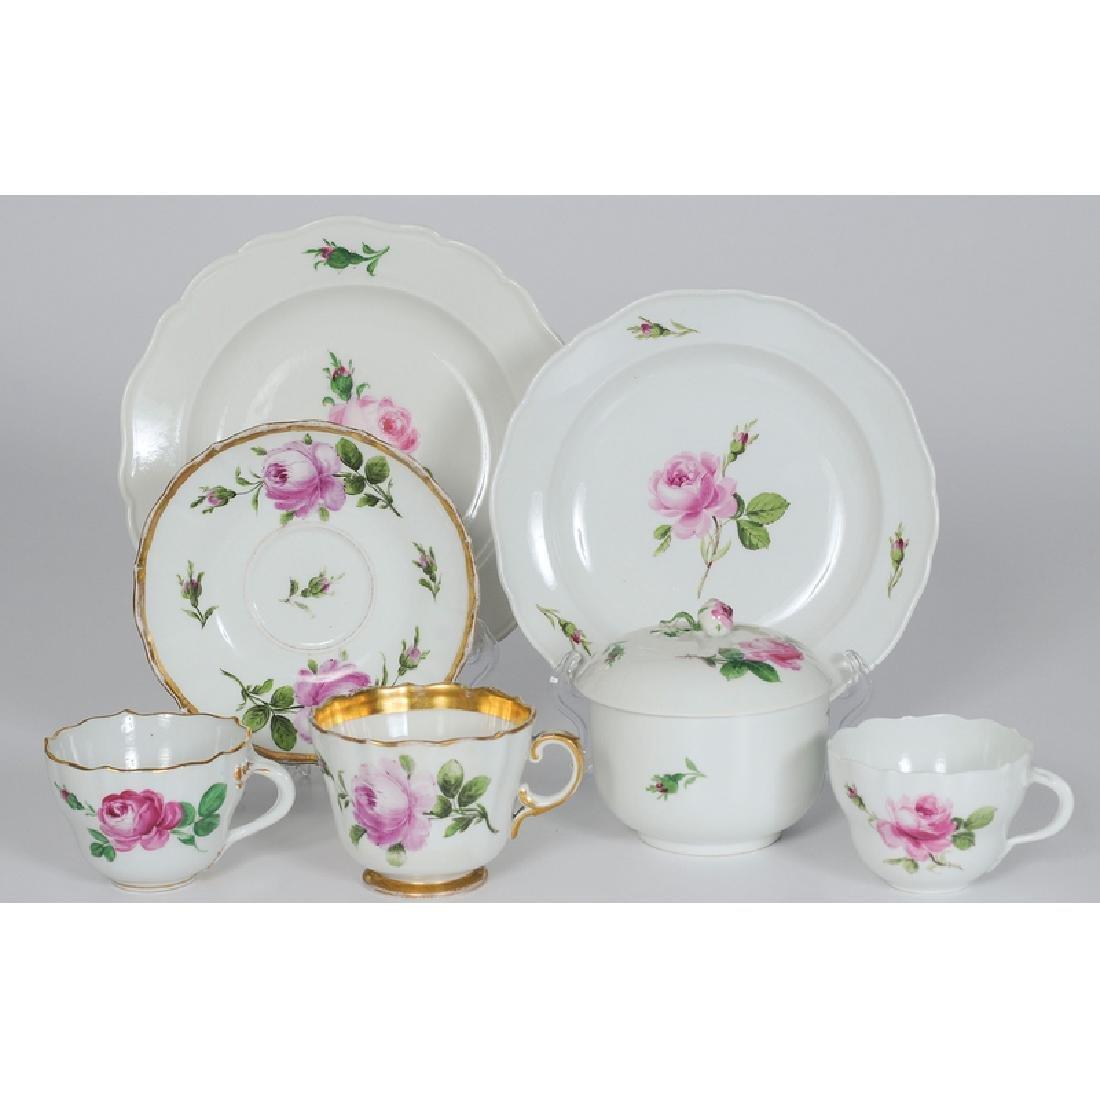 Meissen Porcelain Partial Service, Rose Pink